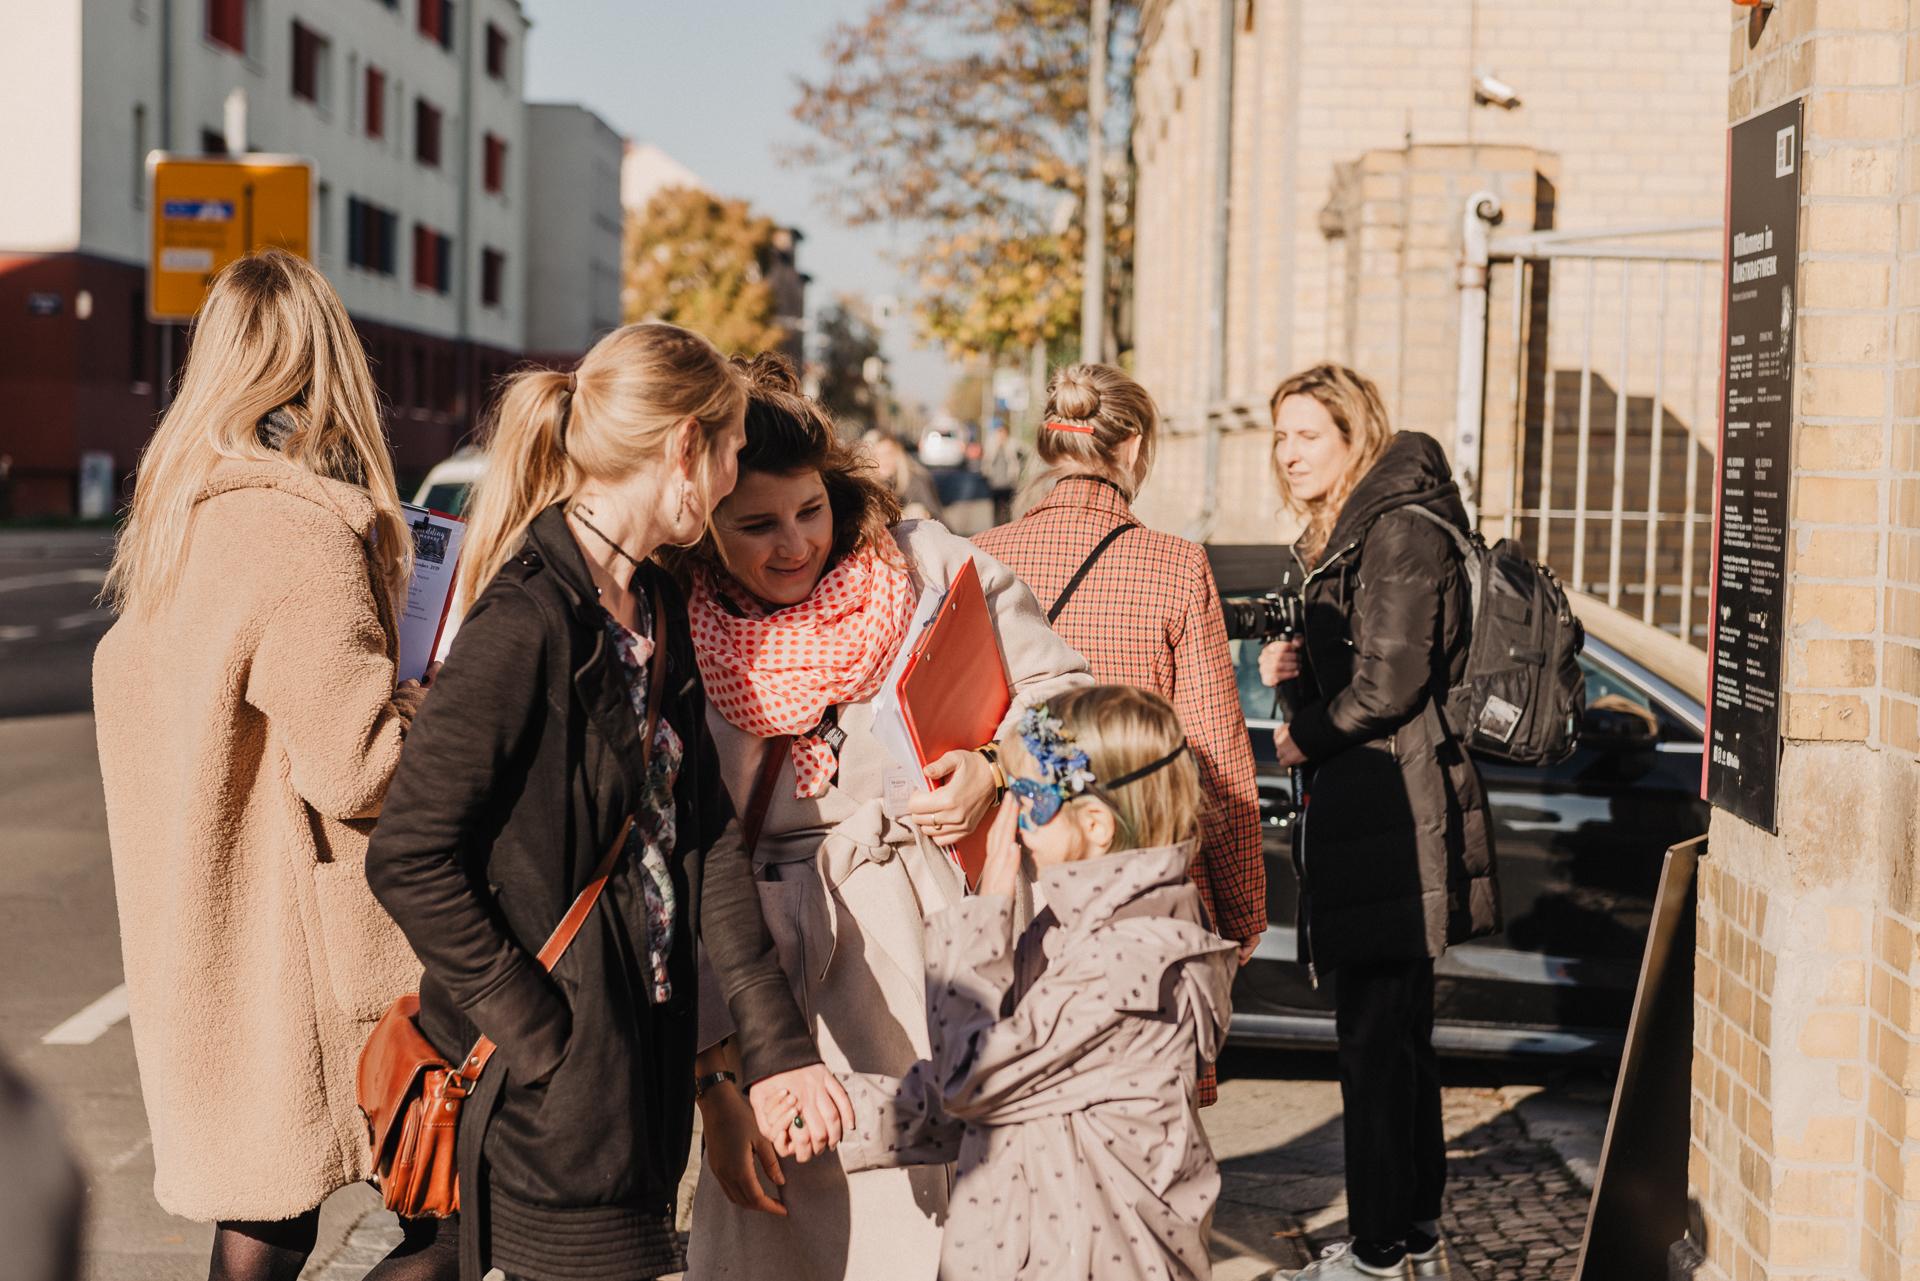 Zweinander-LeonoreHerzog-WeddingMarket-OnTour20191110-8529